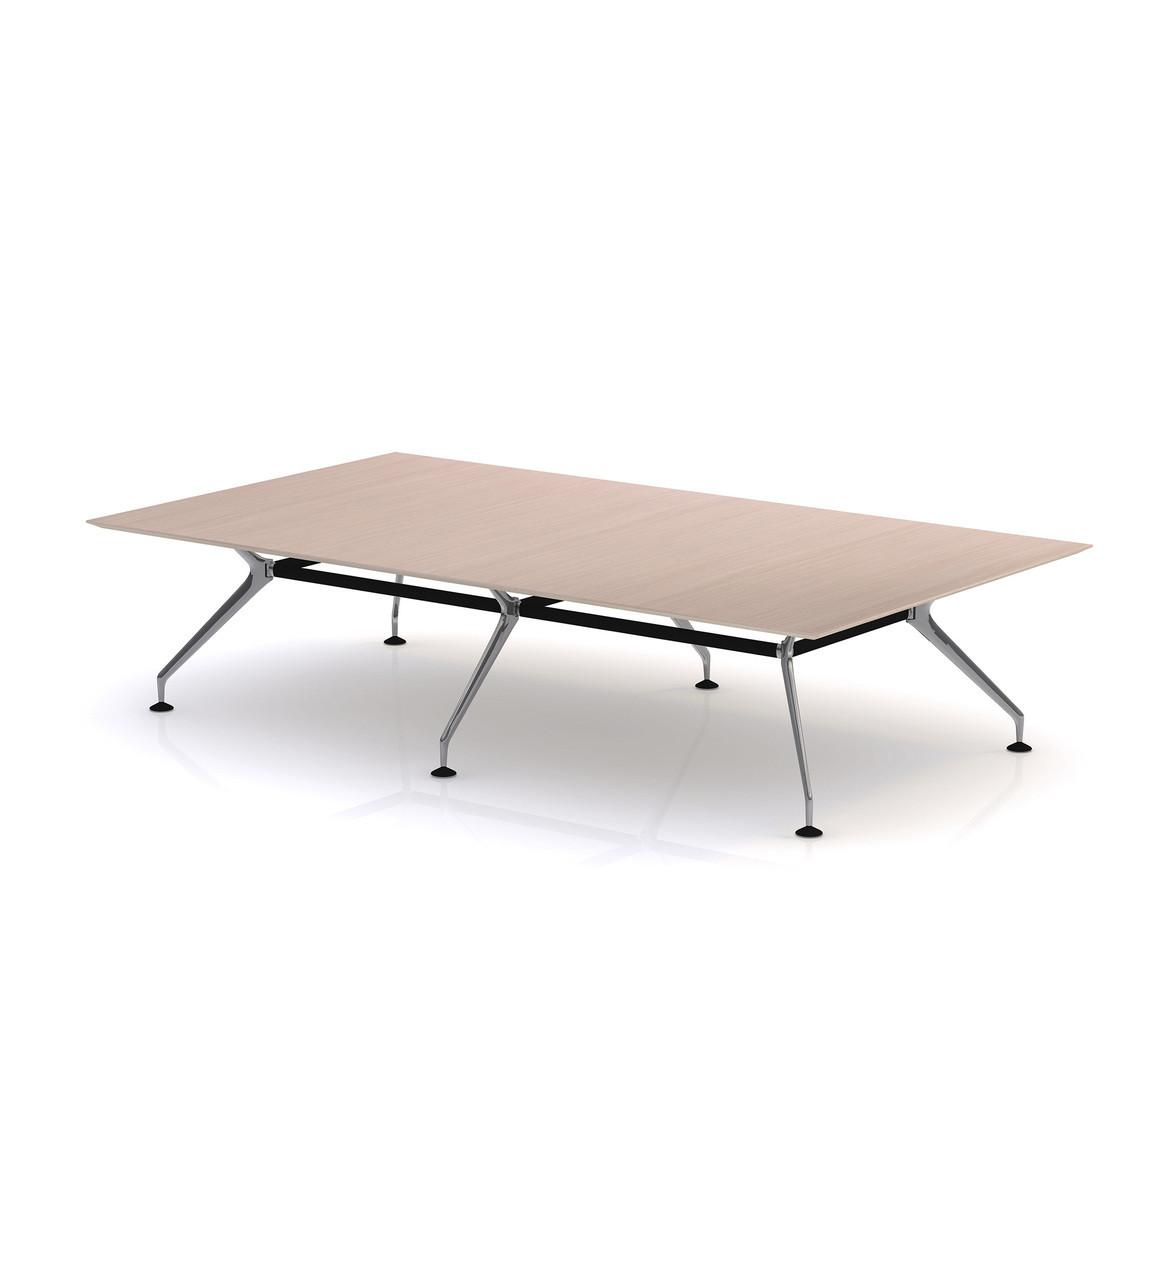 Home Desking & Tables Tables Meeting & Boardroom Orangebox Lano